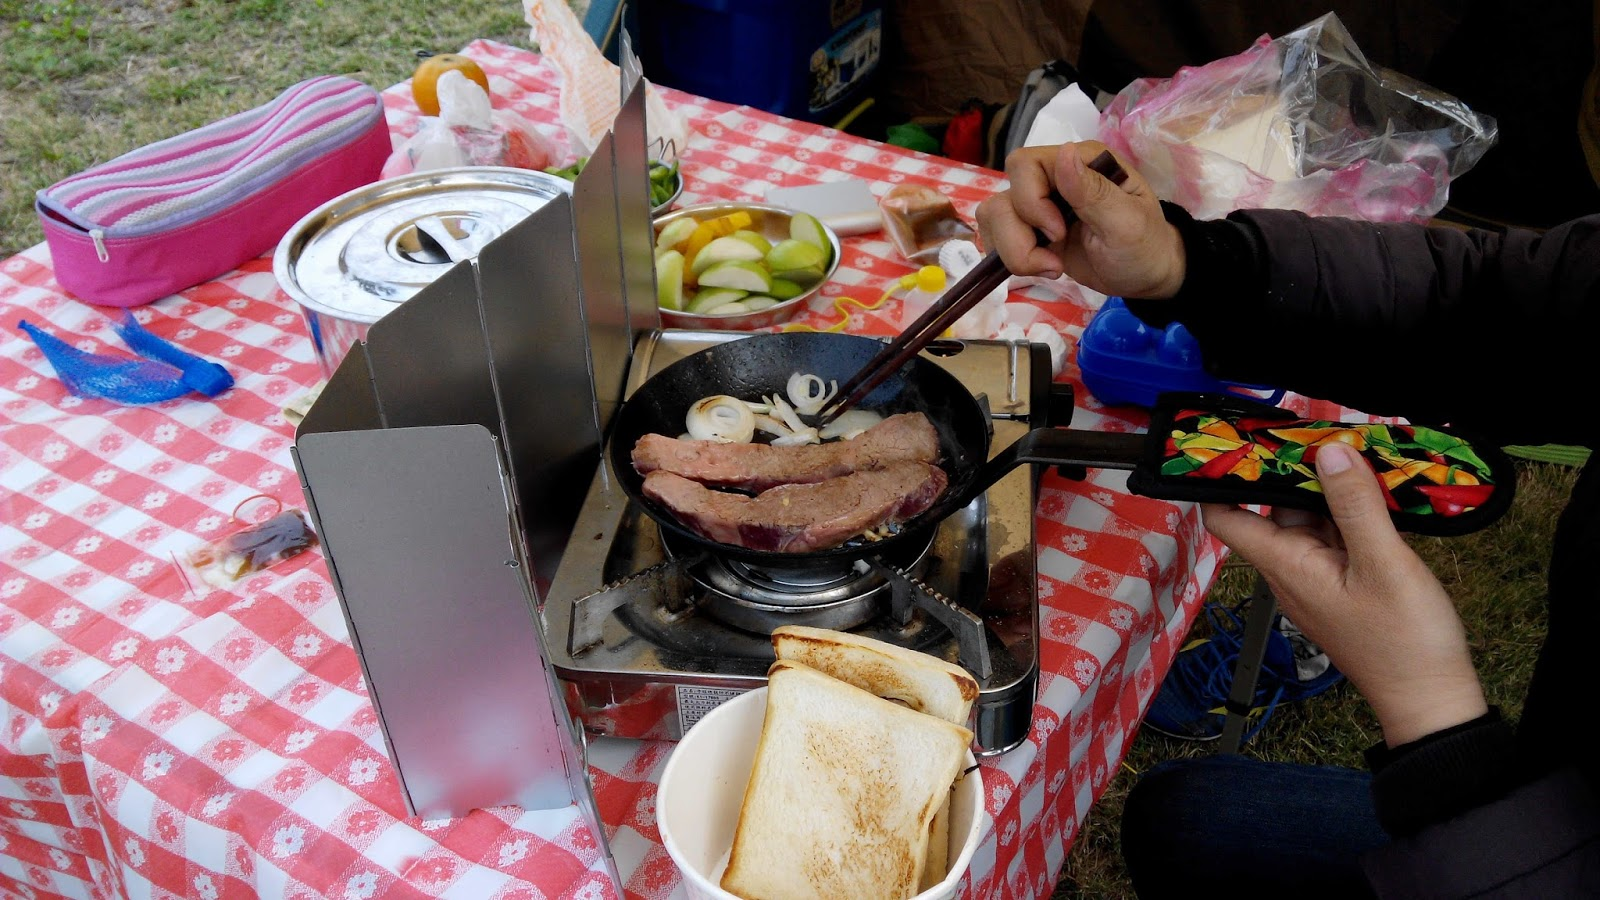 Amazon Kitchen Table Backsplash Tile Lowes 露營裝備980h蛋捲桌 談談家庭露營中行動廚房的必要性 W 全家